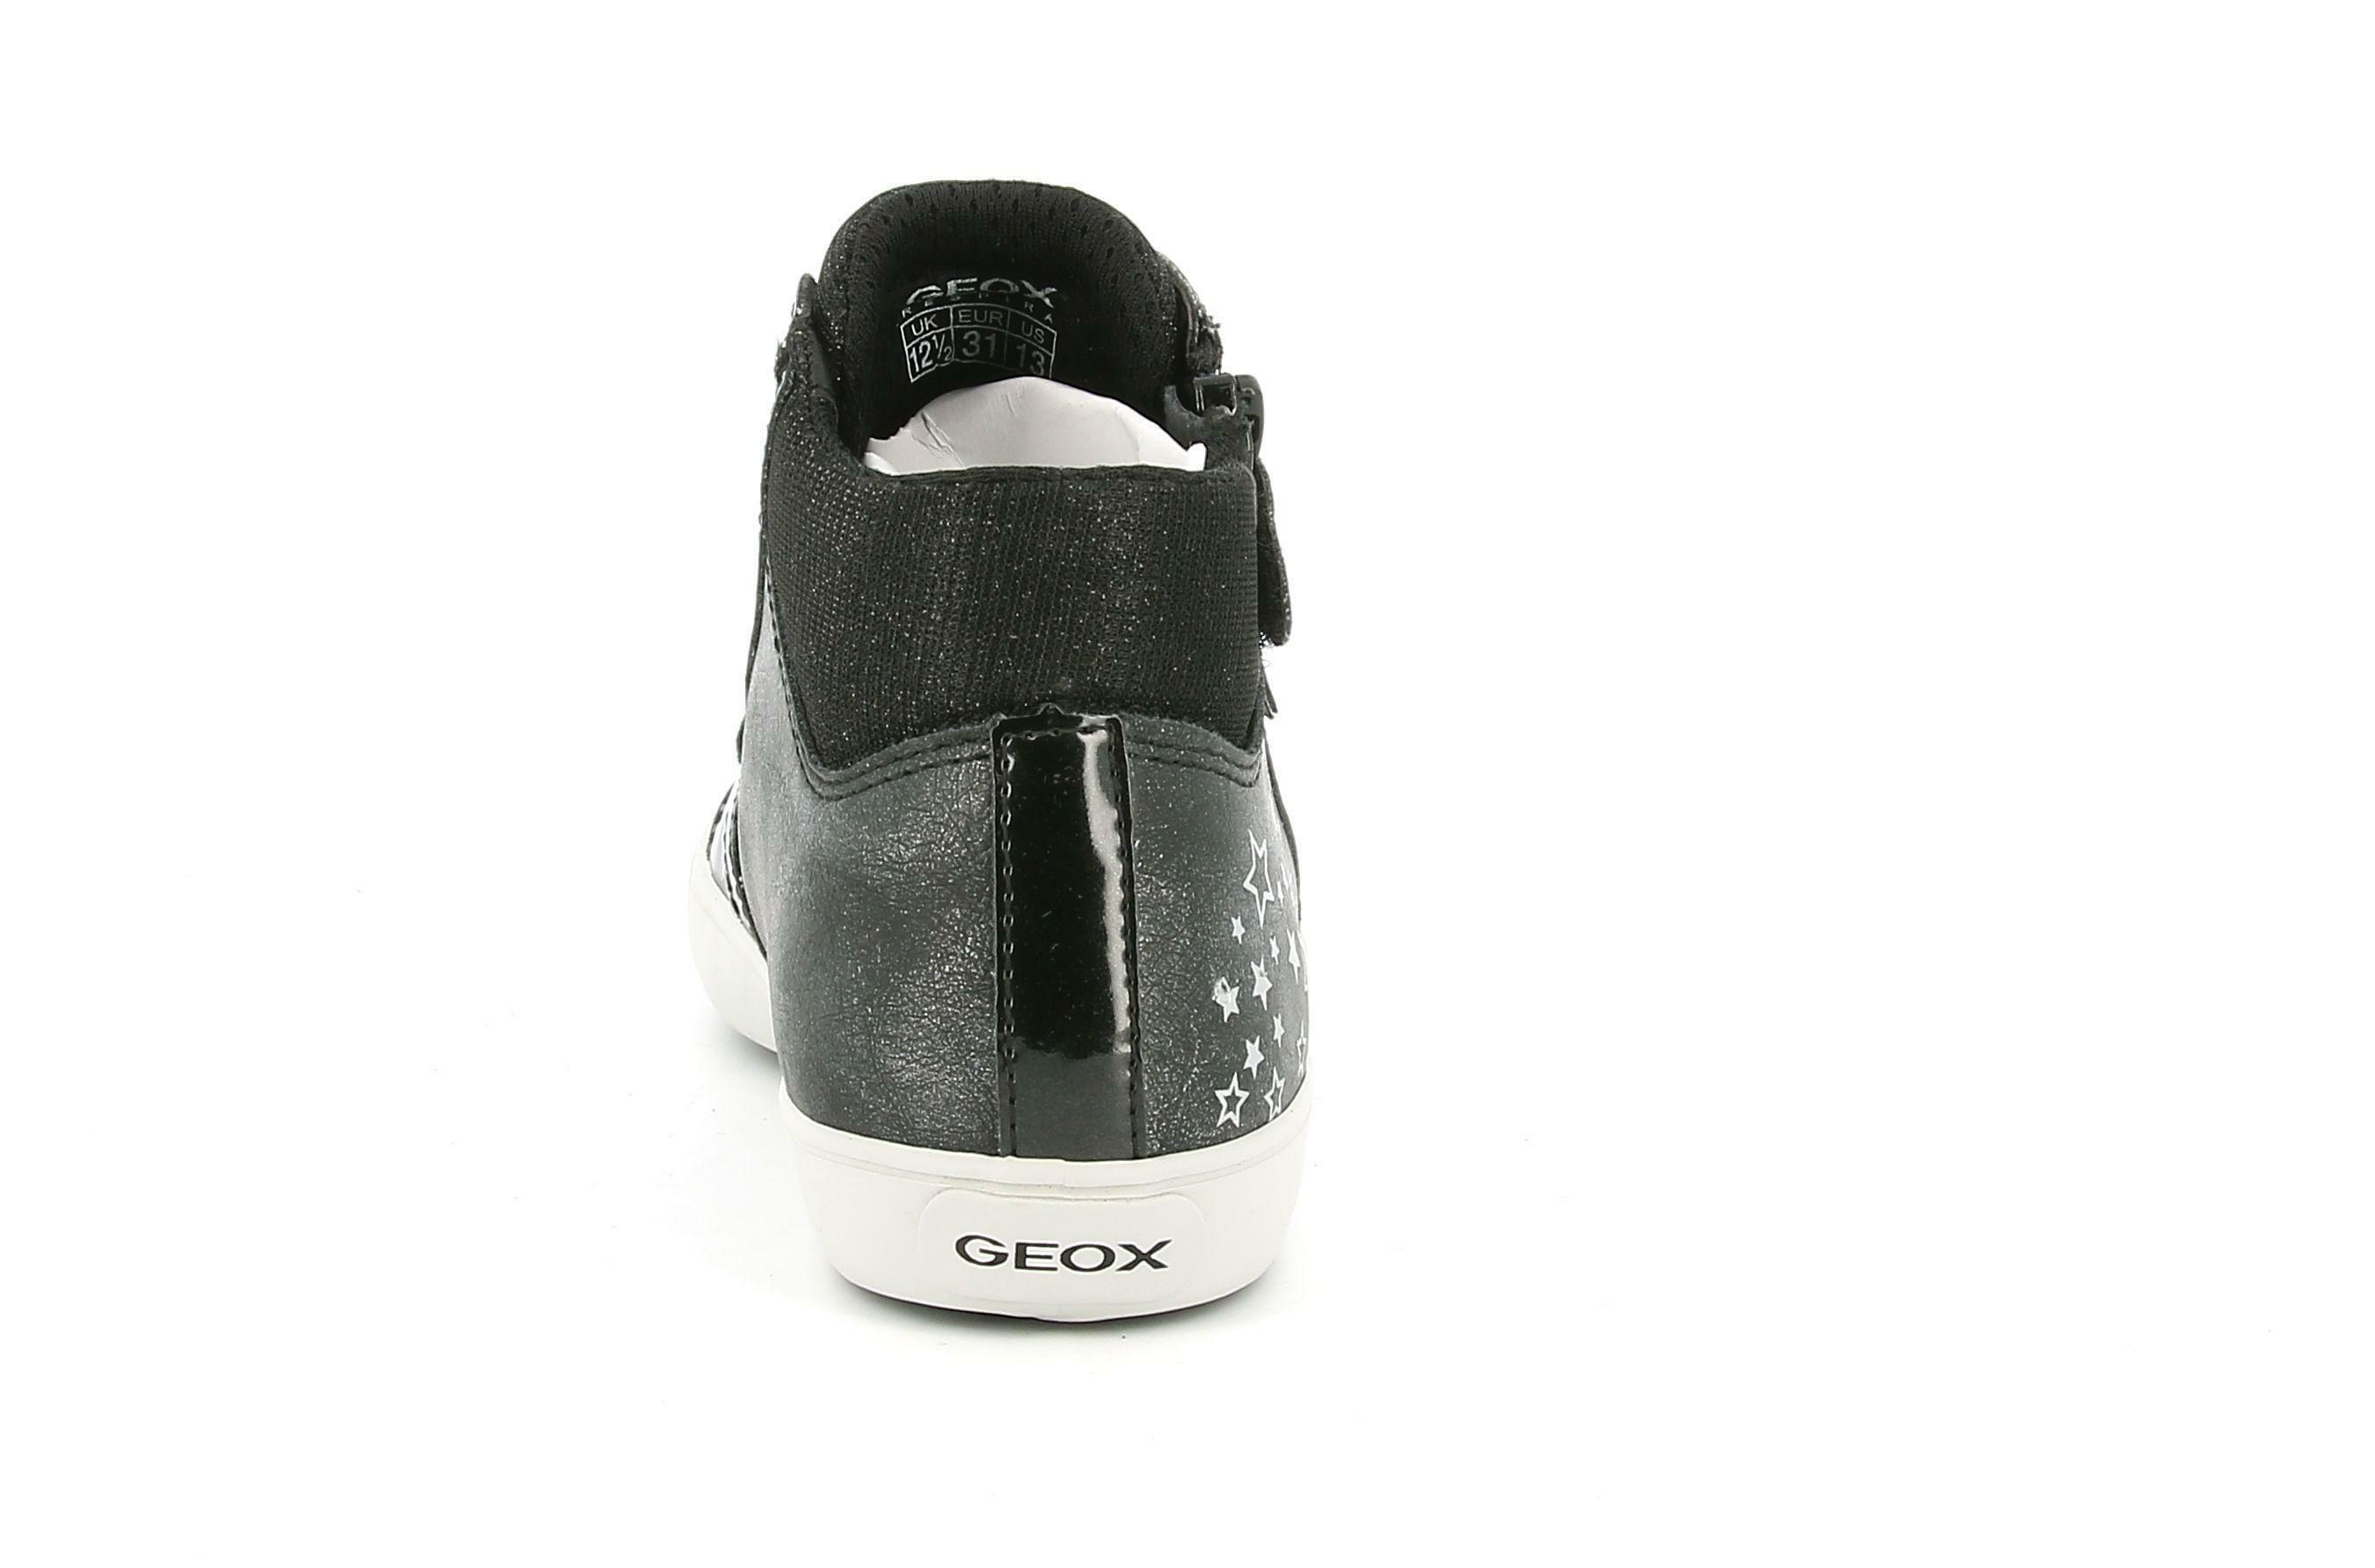 geox geox sportive per bambina j024nd 054pv j gisli c9002 dk grey size map